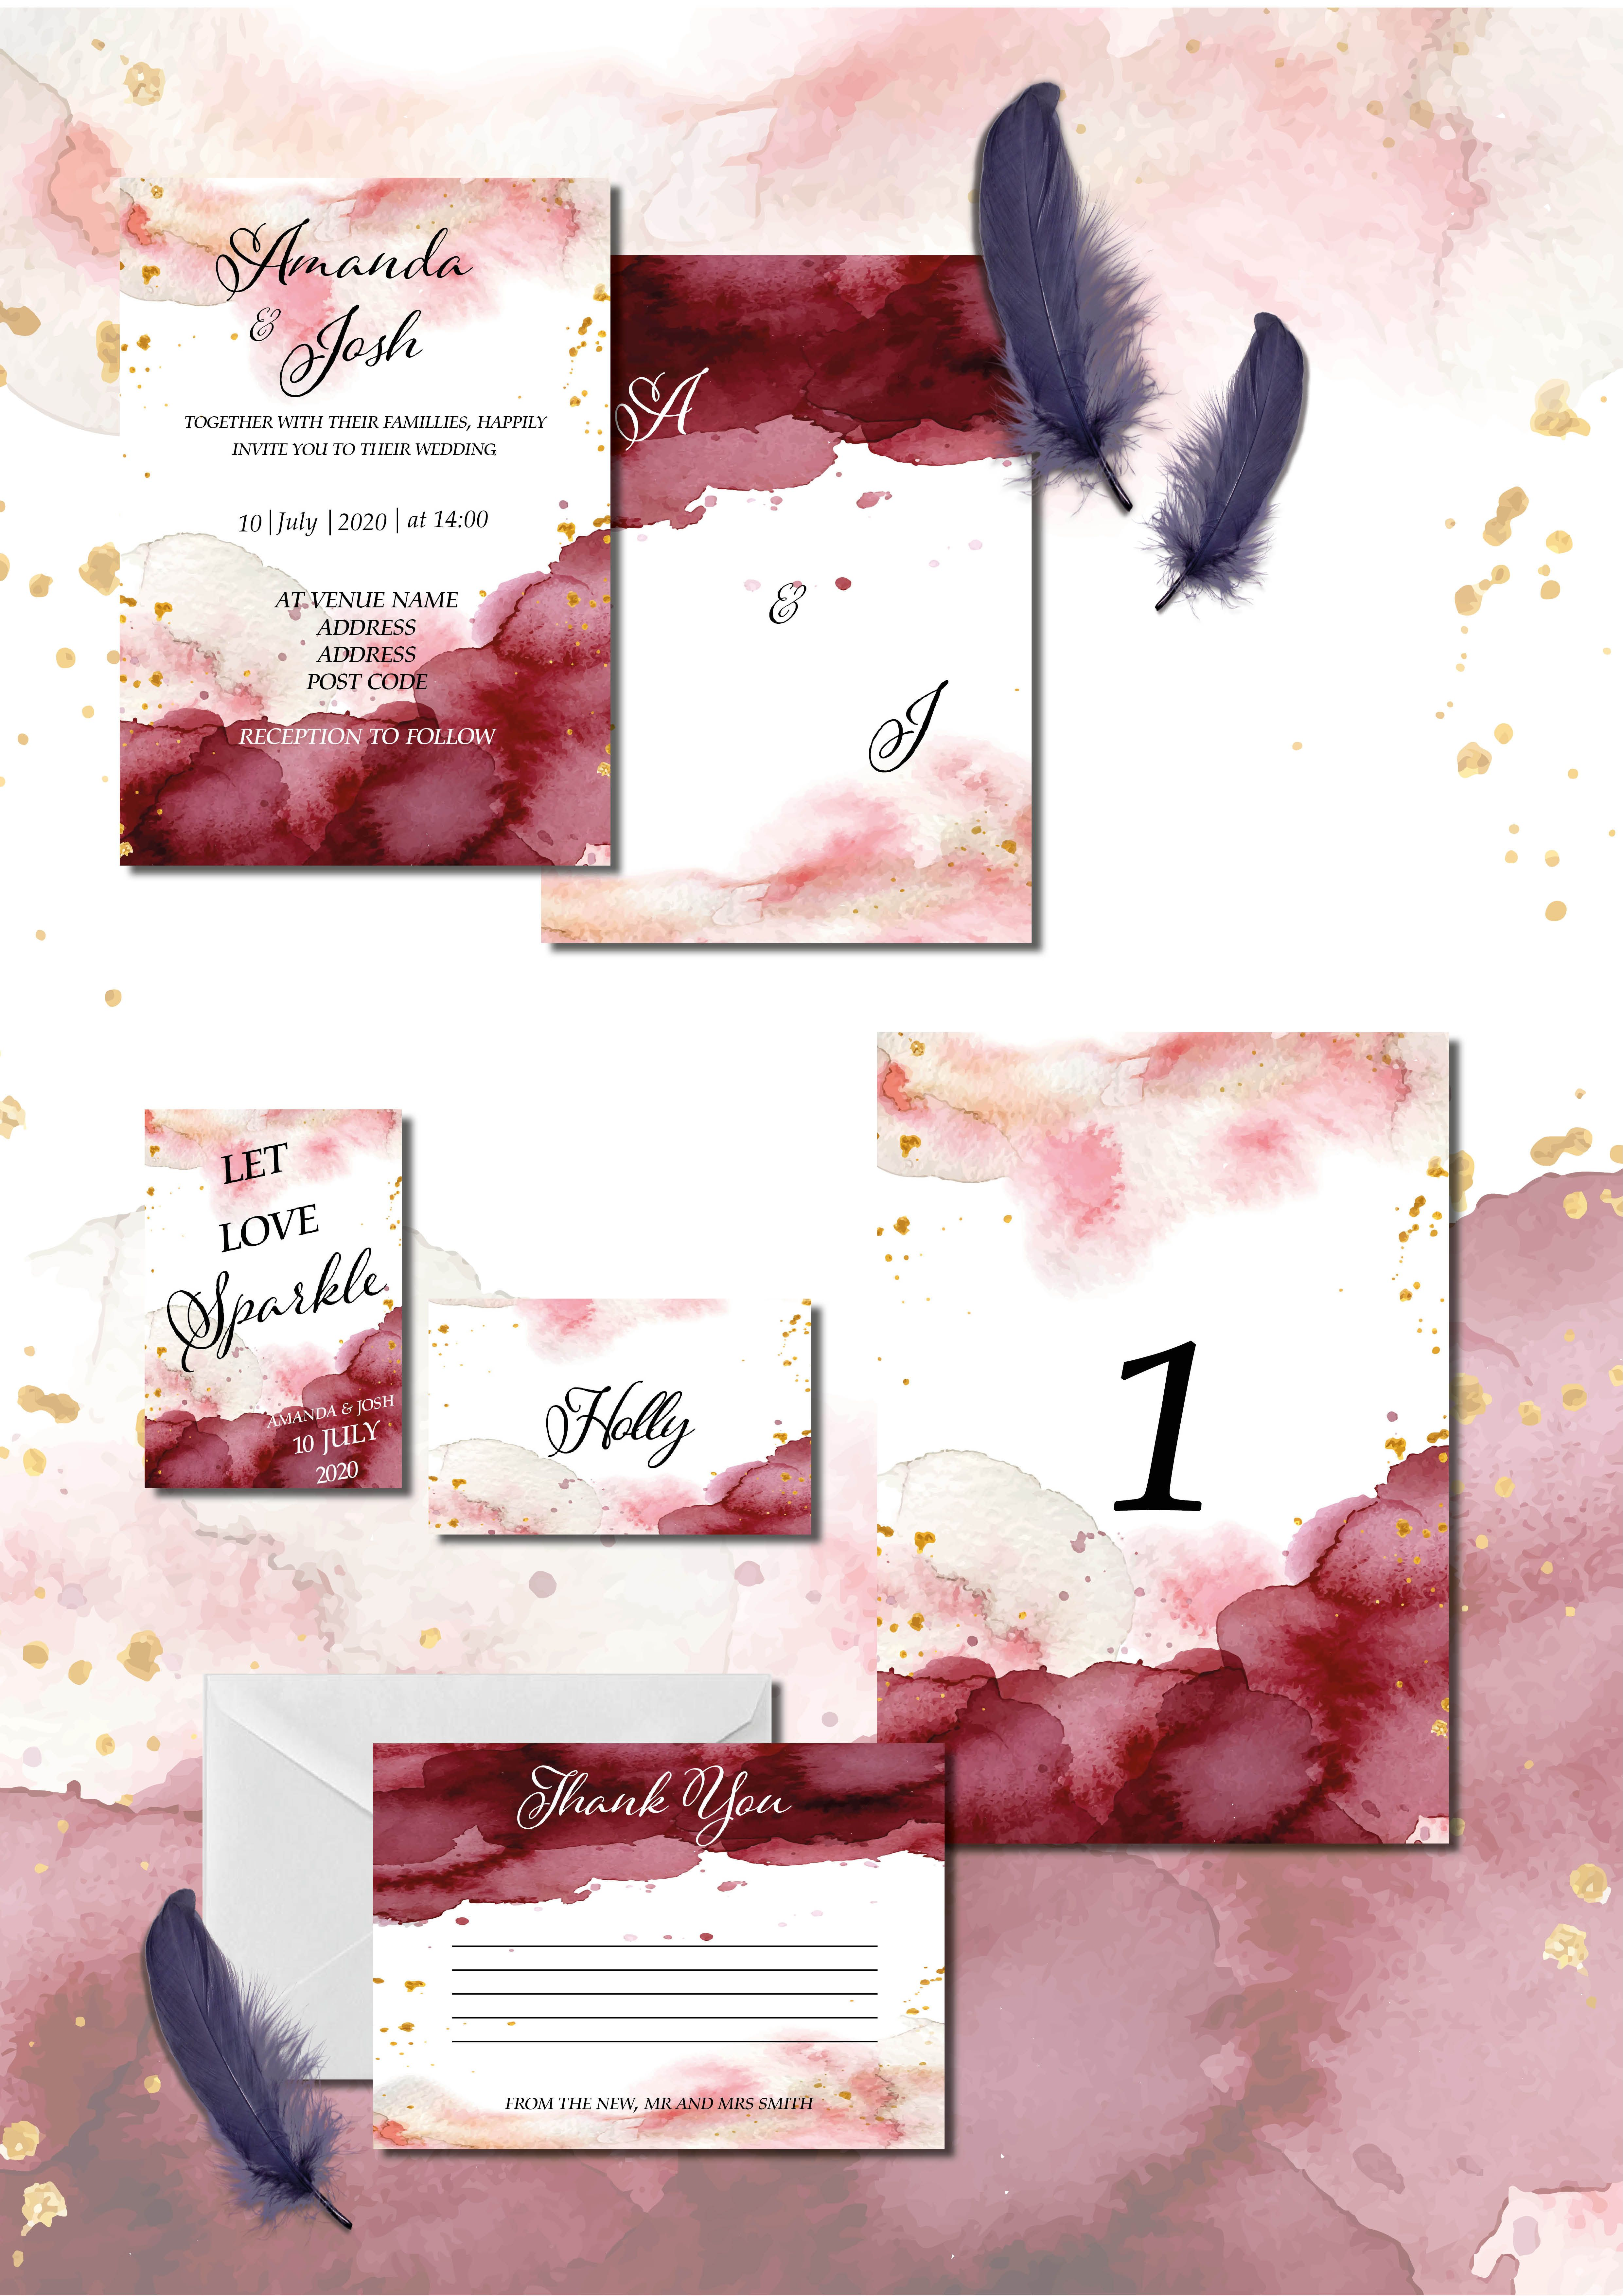 Burgundy, maroon and pink watercolour wedding invitation